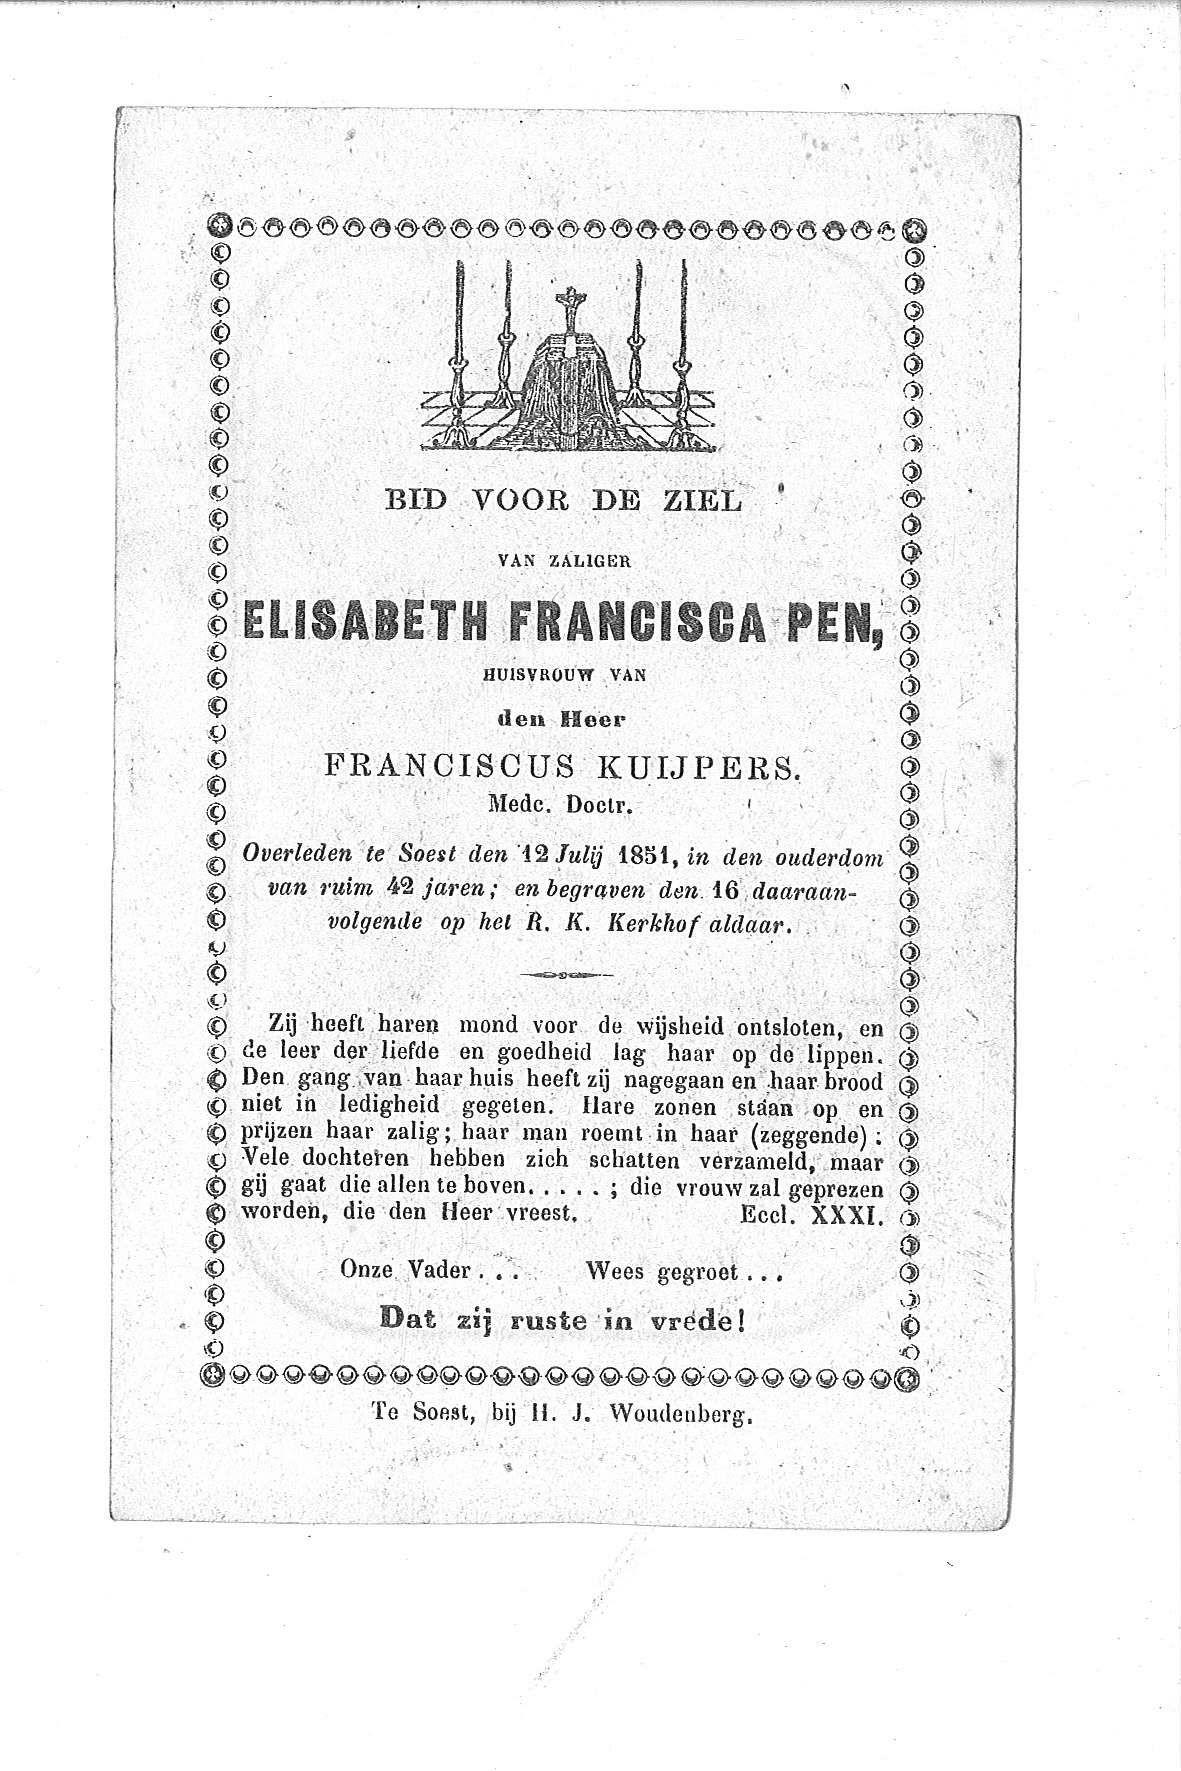 Elisabeth-Francisca(1851)20100407100949_00031.jpg